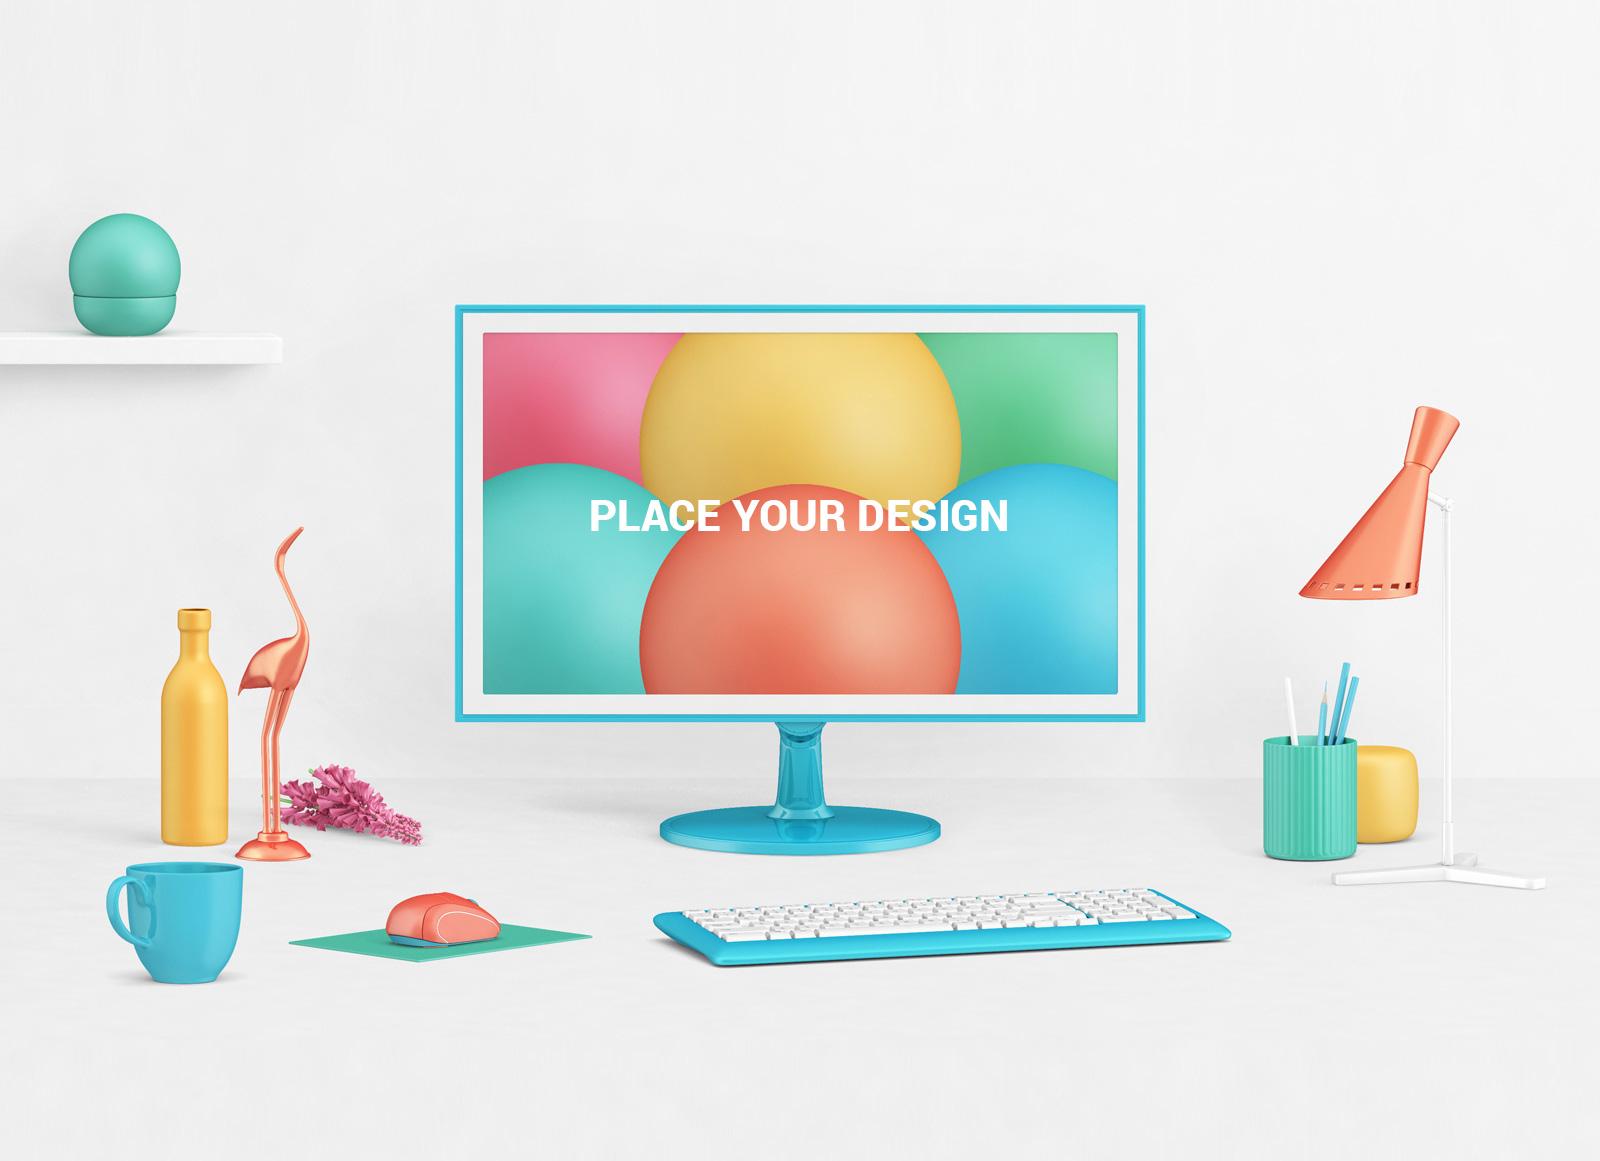 Free Photorealistic Lcd Monitor Mockup Psd With Decor Items Good